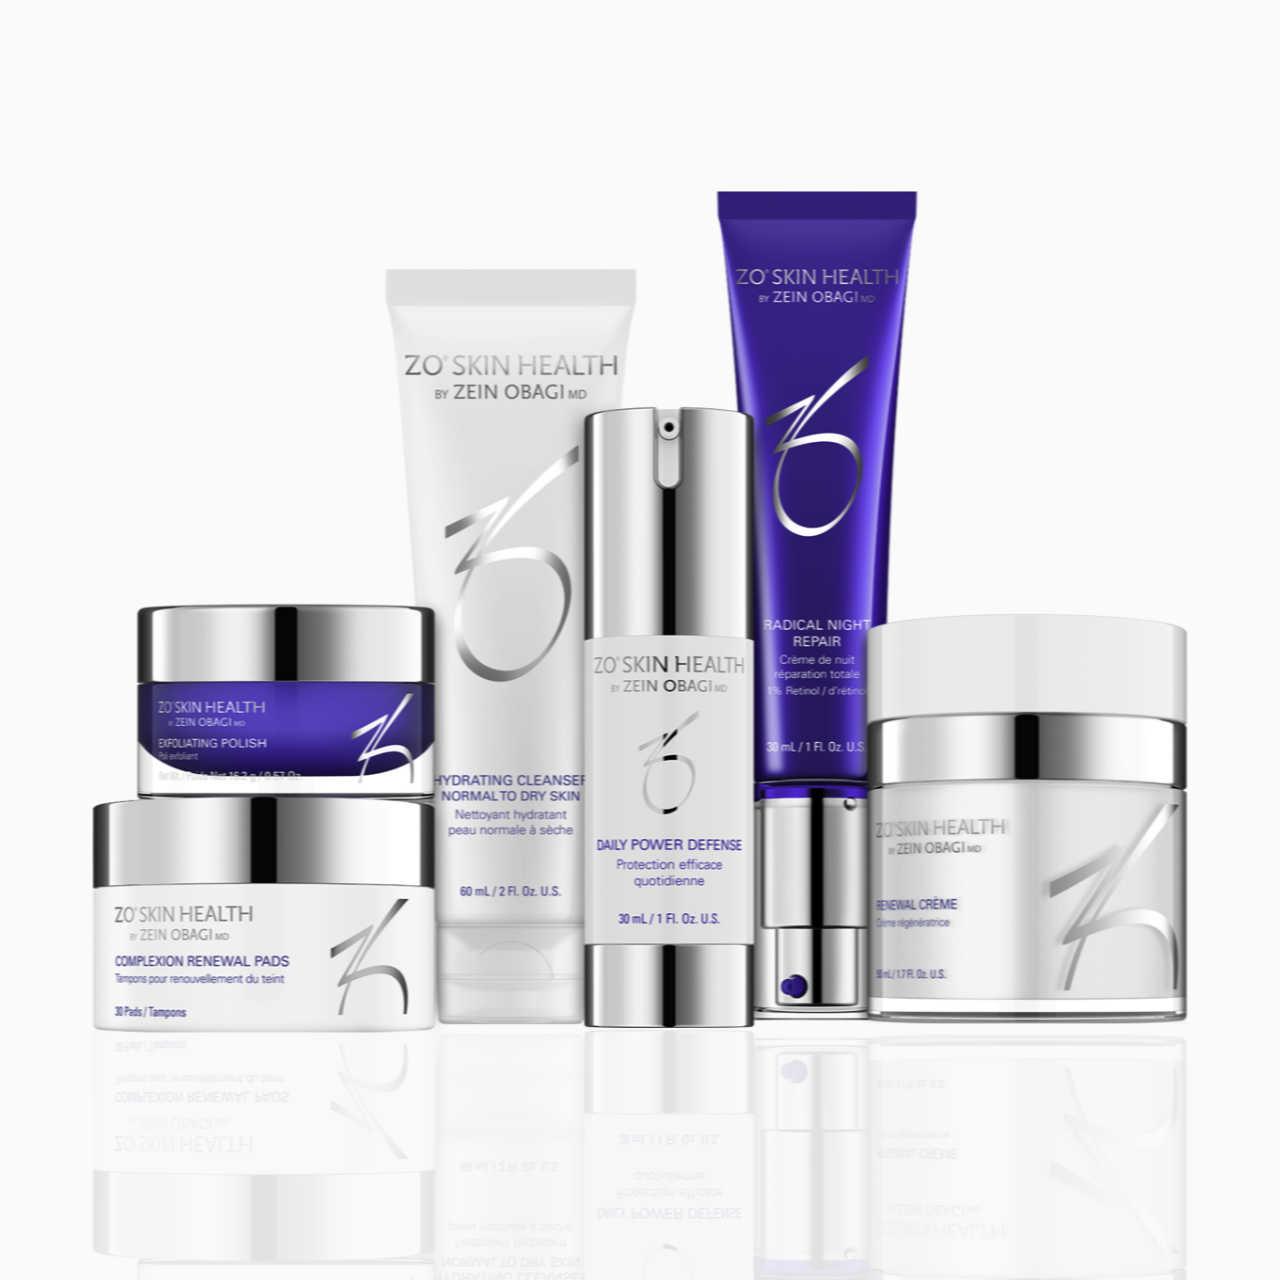 ZO Skin Health Aggressive Anti-Ageing Program